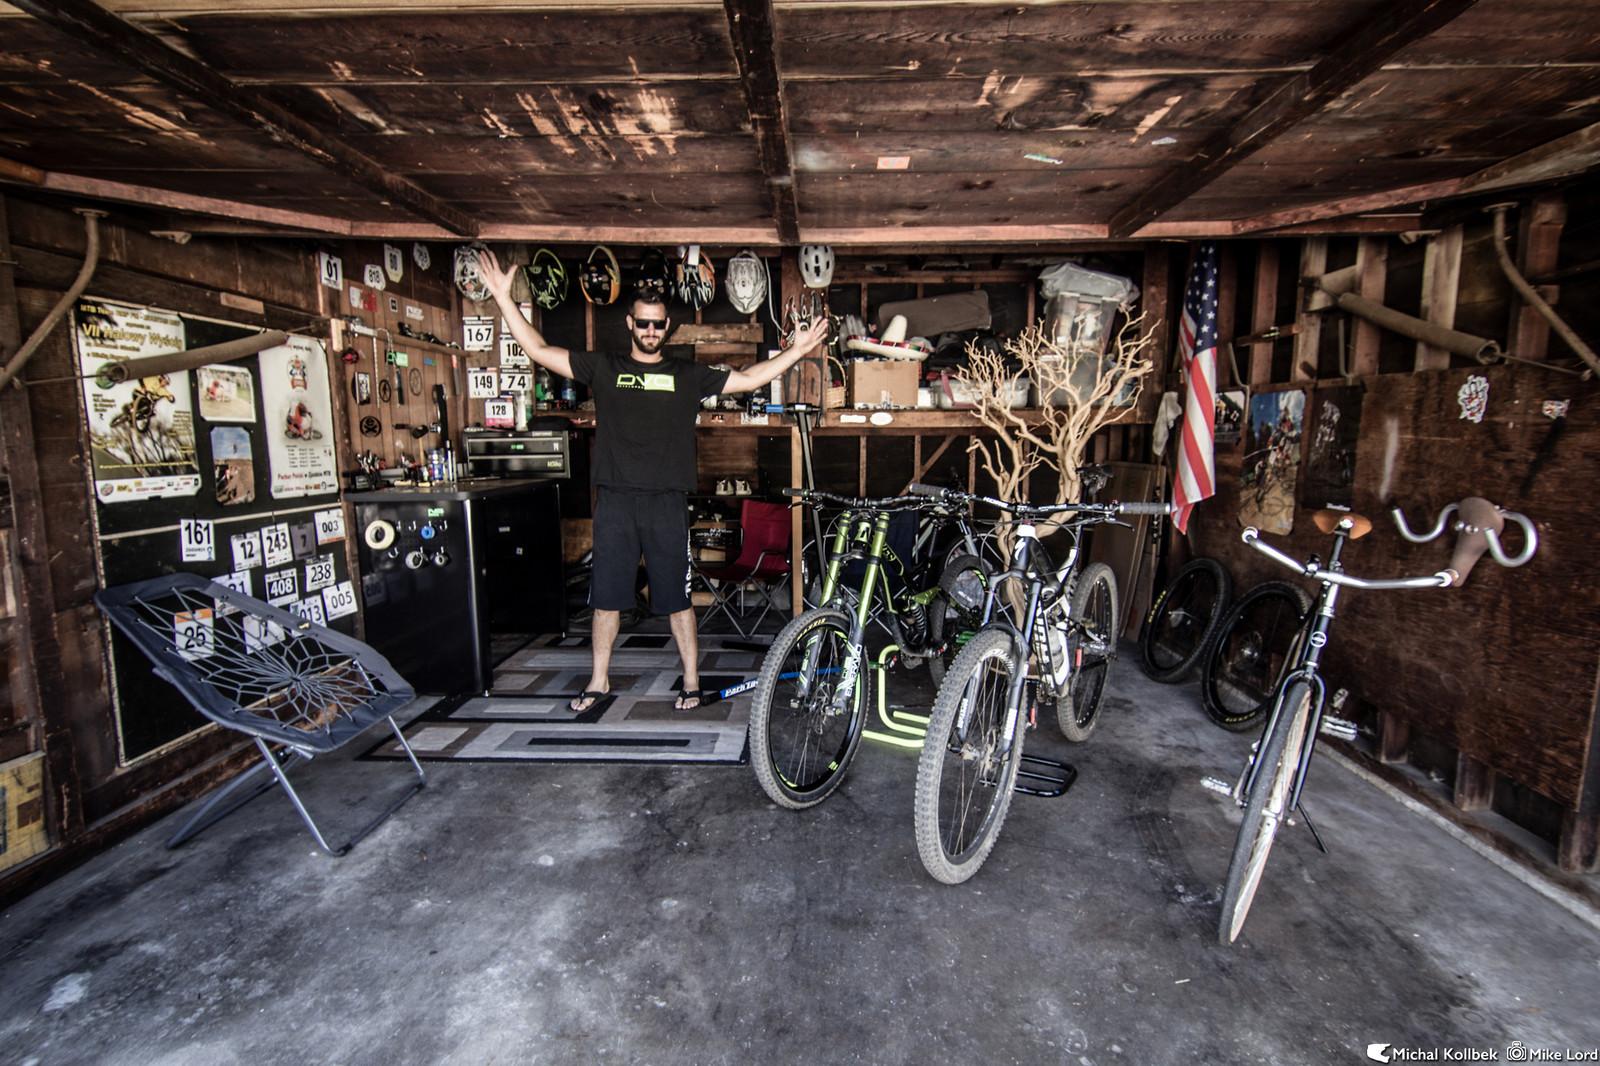 Man Cave Bet Instagram : Michal kollbek man cave mikelord mountain biking